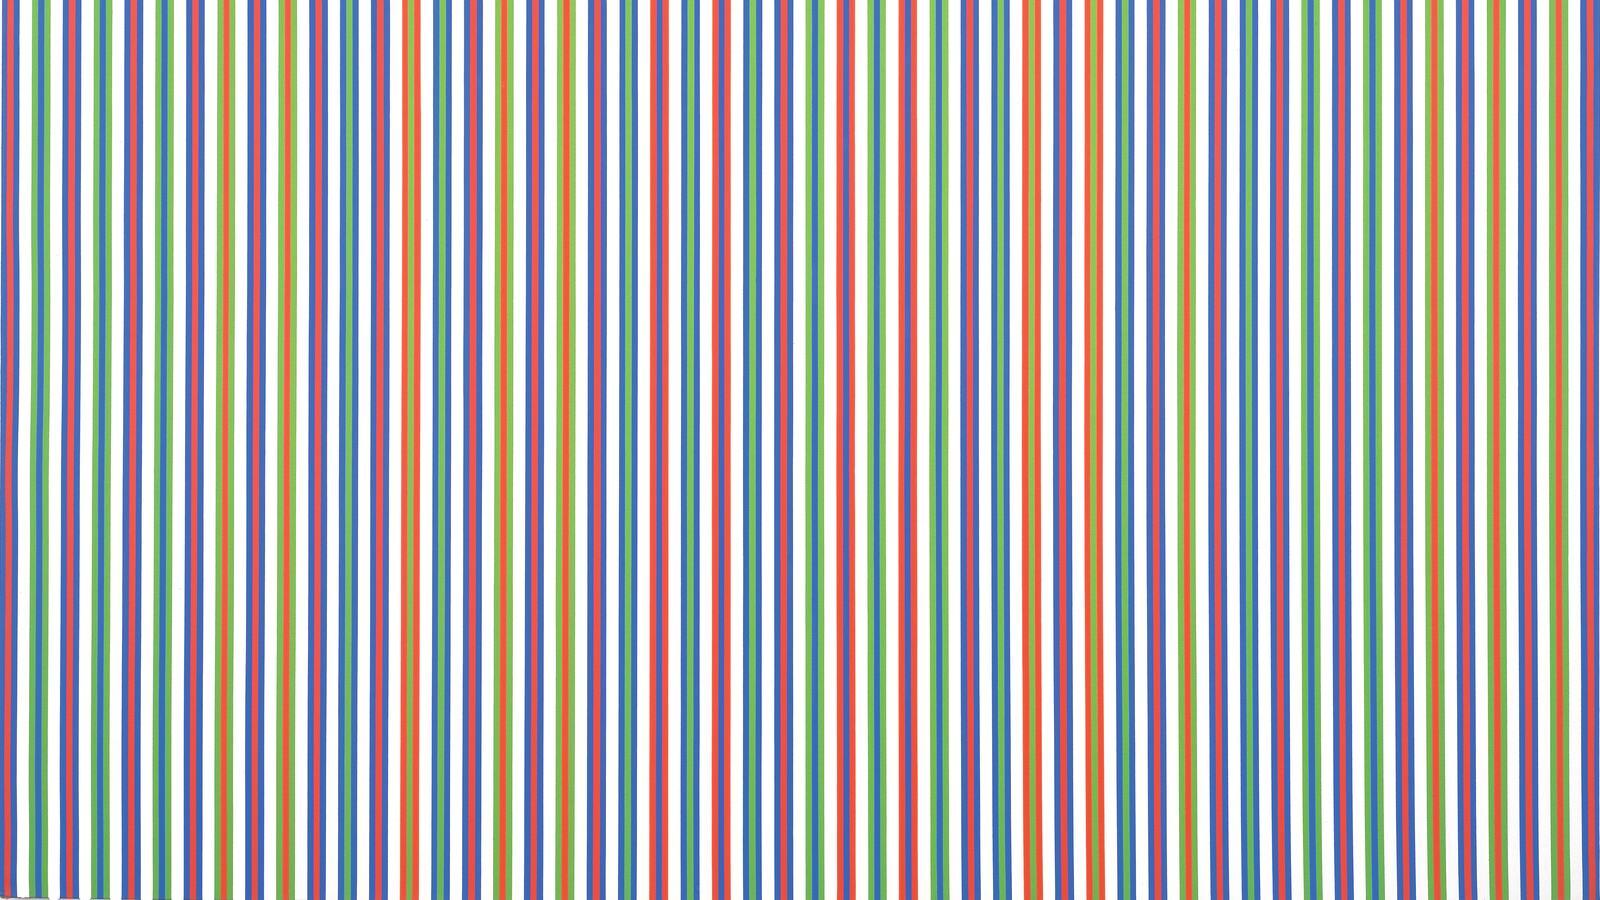 Bridget Riley, Paean (detail), 1973. Acrylic on canvas. 290.2 x 287.3 cm. © Bridget Riley 2019. All rights reserved.